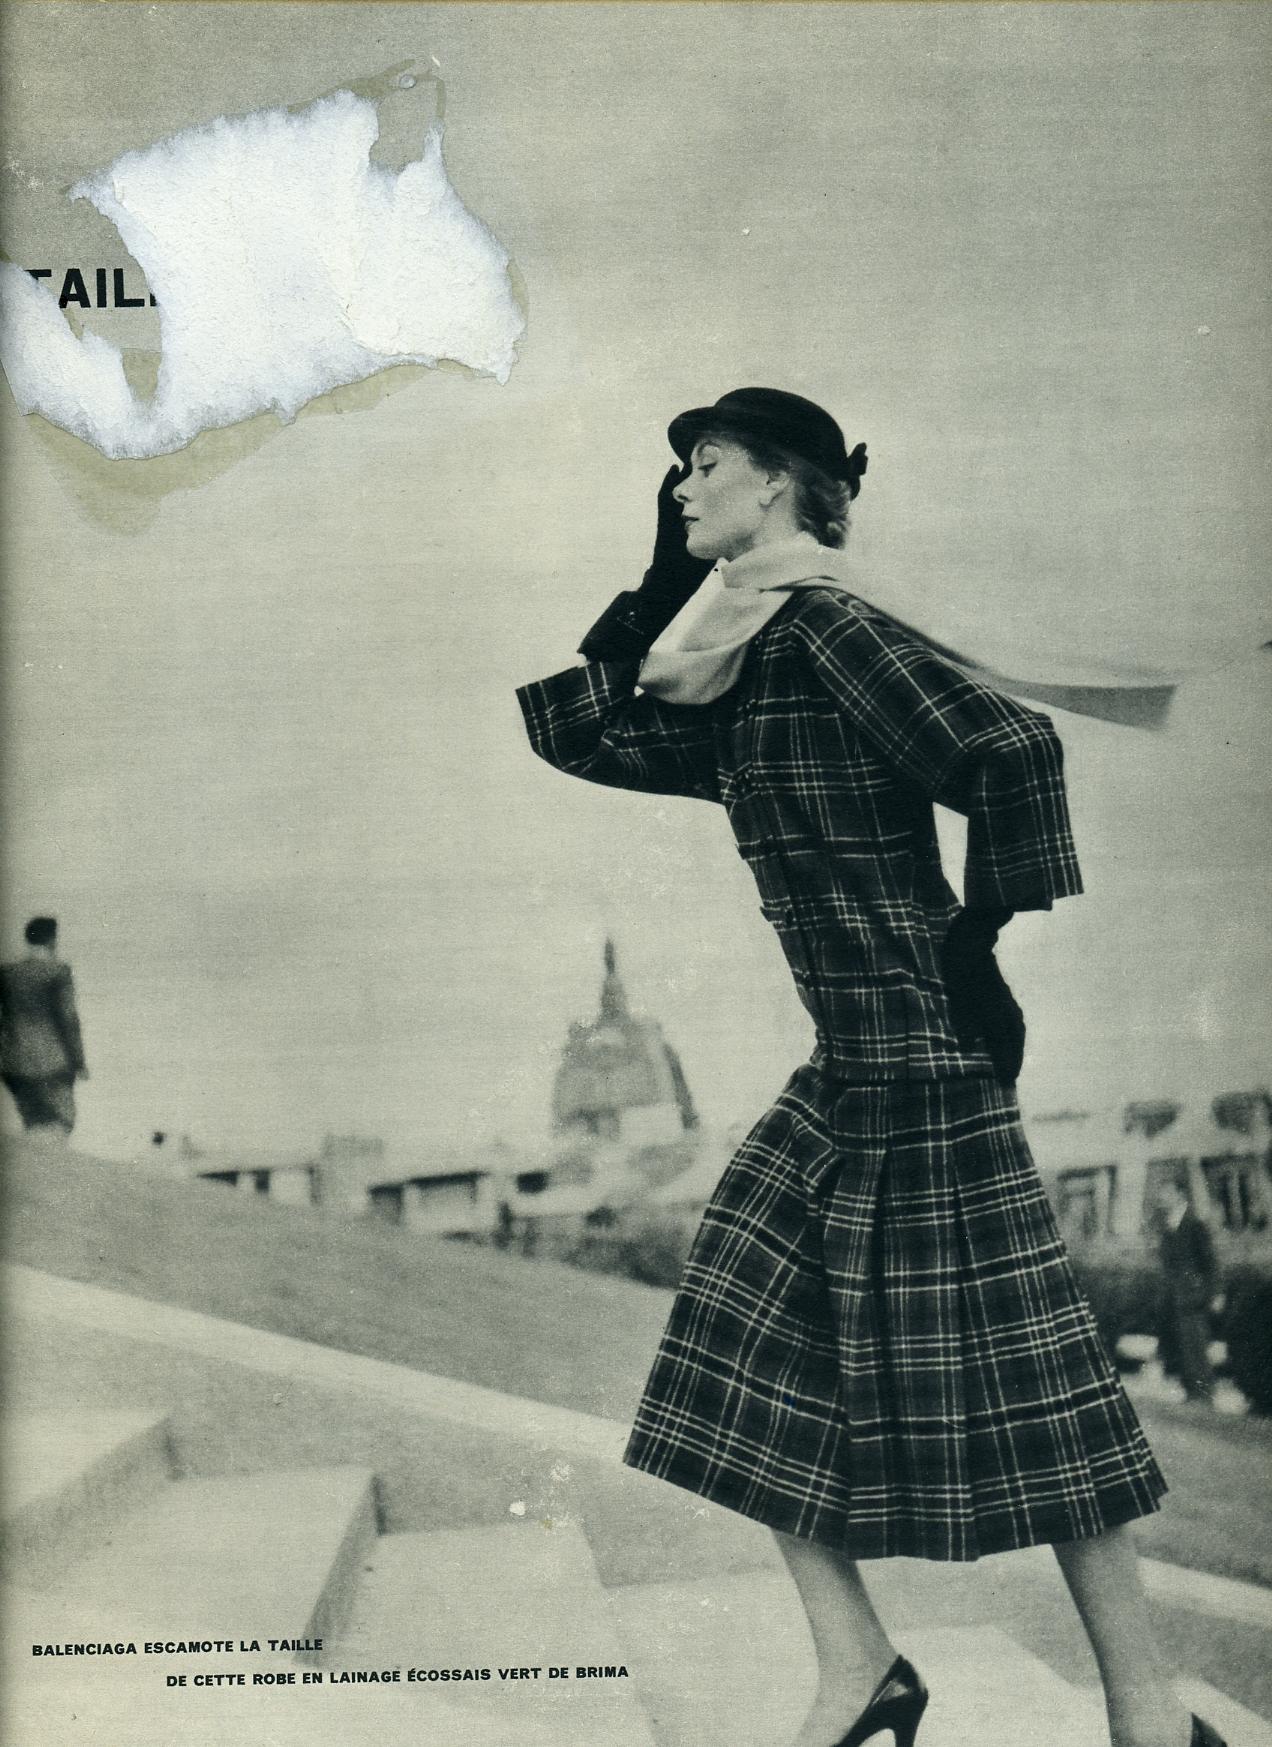 Expositor publicitario con página de revista con fotografía con modelo de Balenciaga